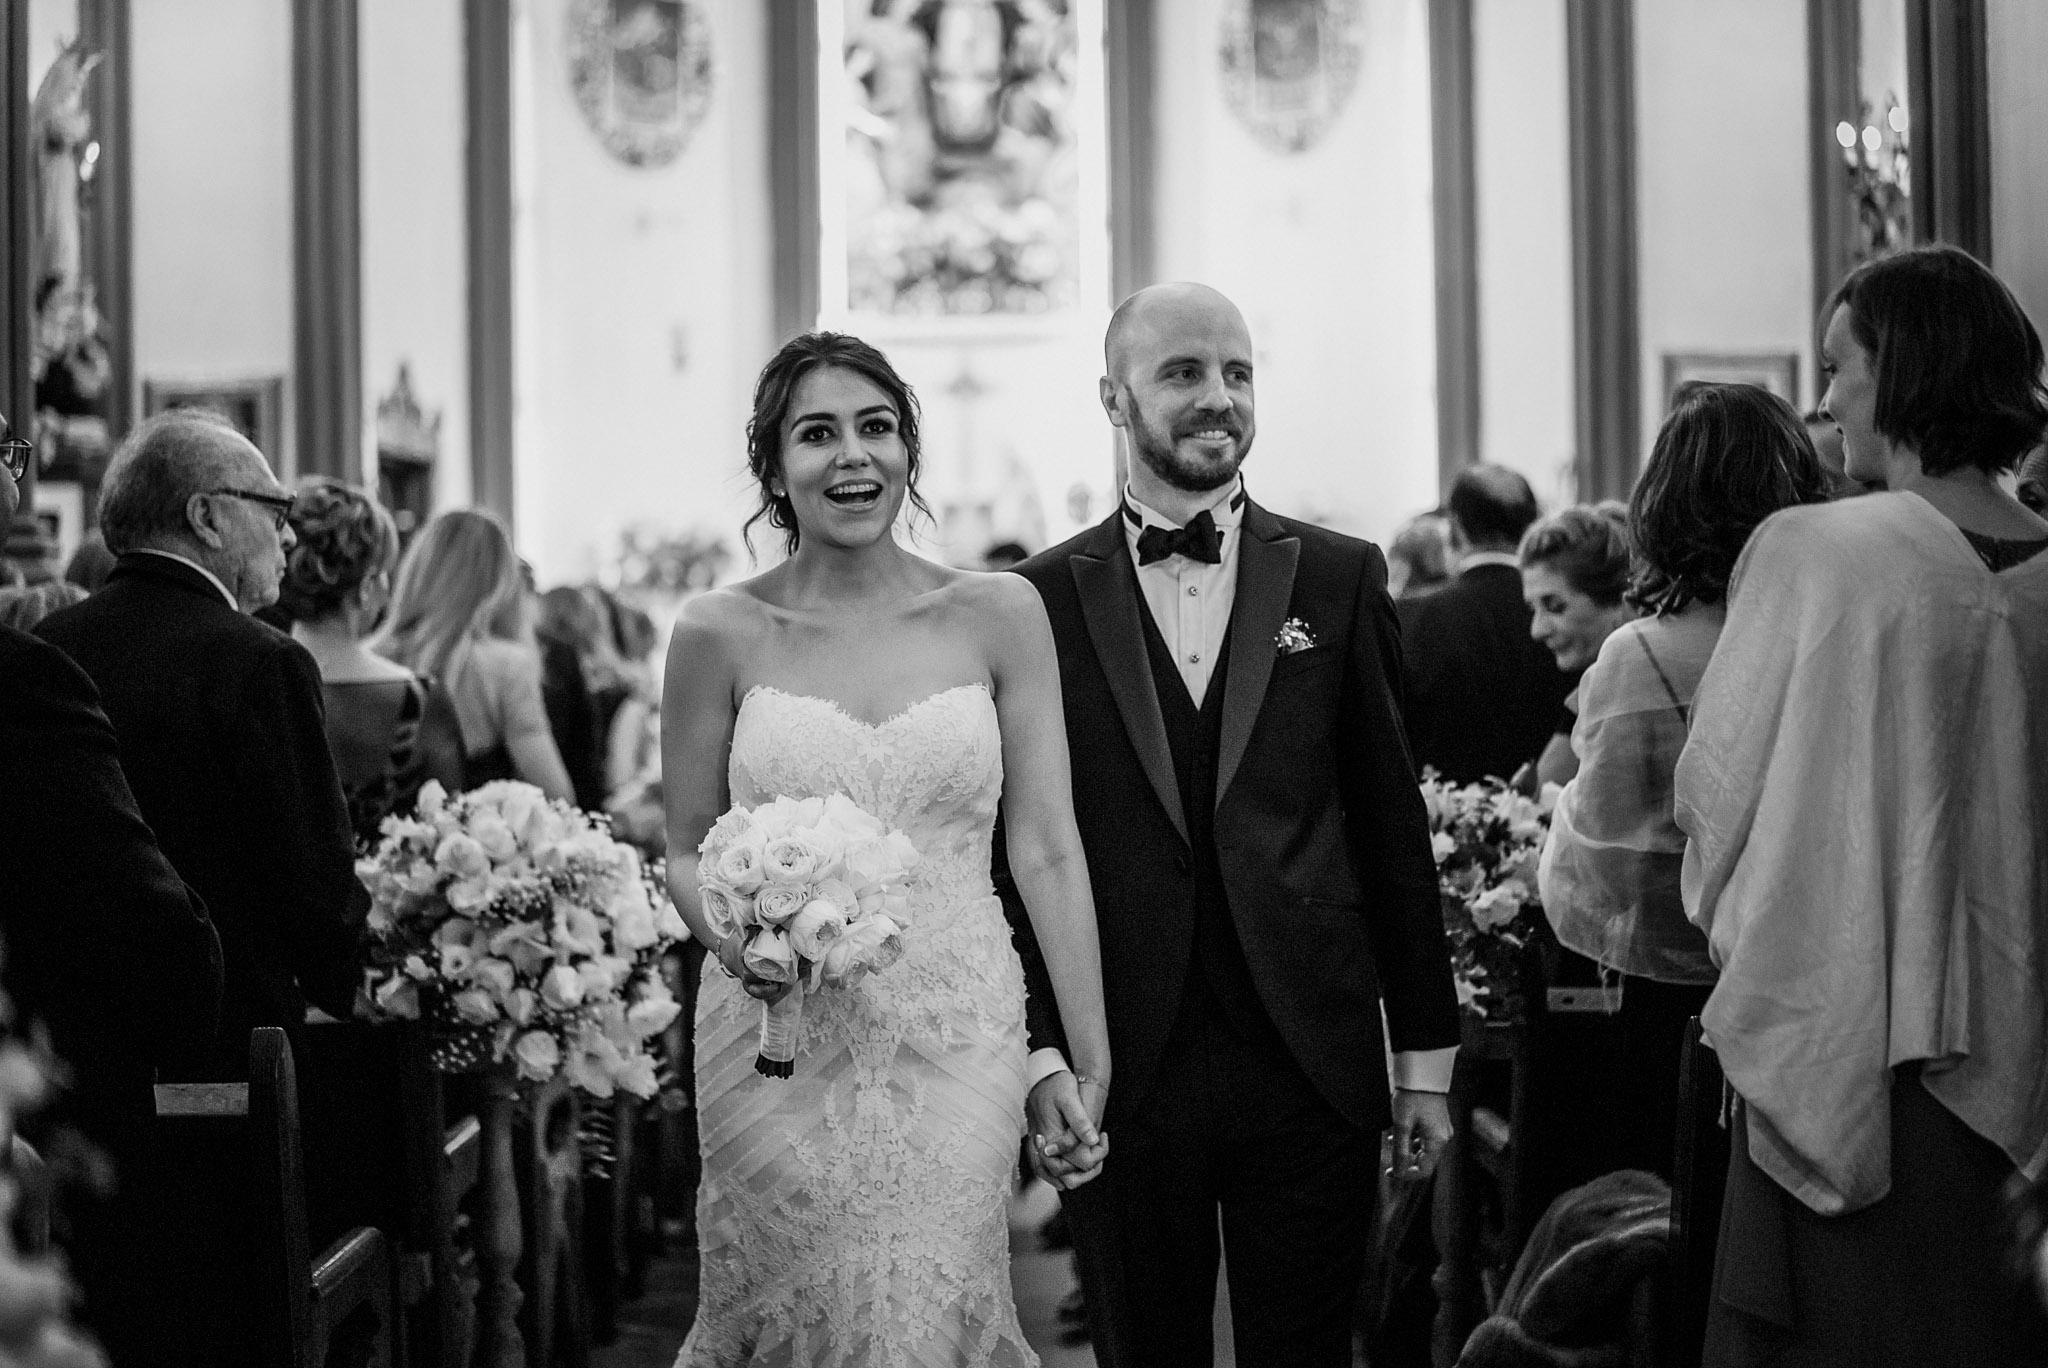 ©www.mauriziosolisbroca.com-20161001maurizio-solis-broca-mexico-canada-wedding-photographer20161001DSC07944-Edit.jpg